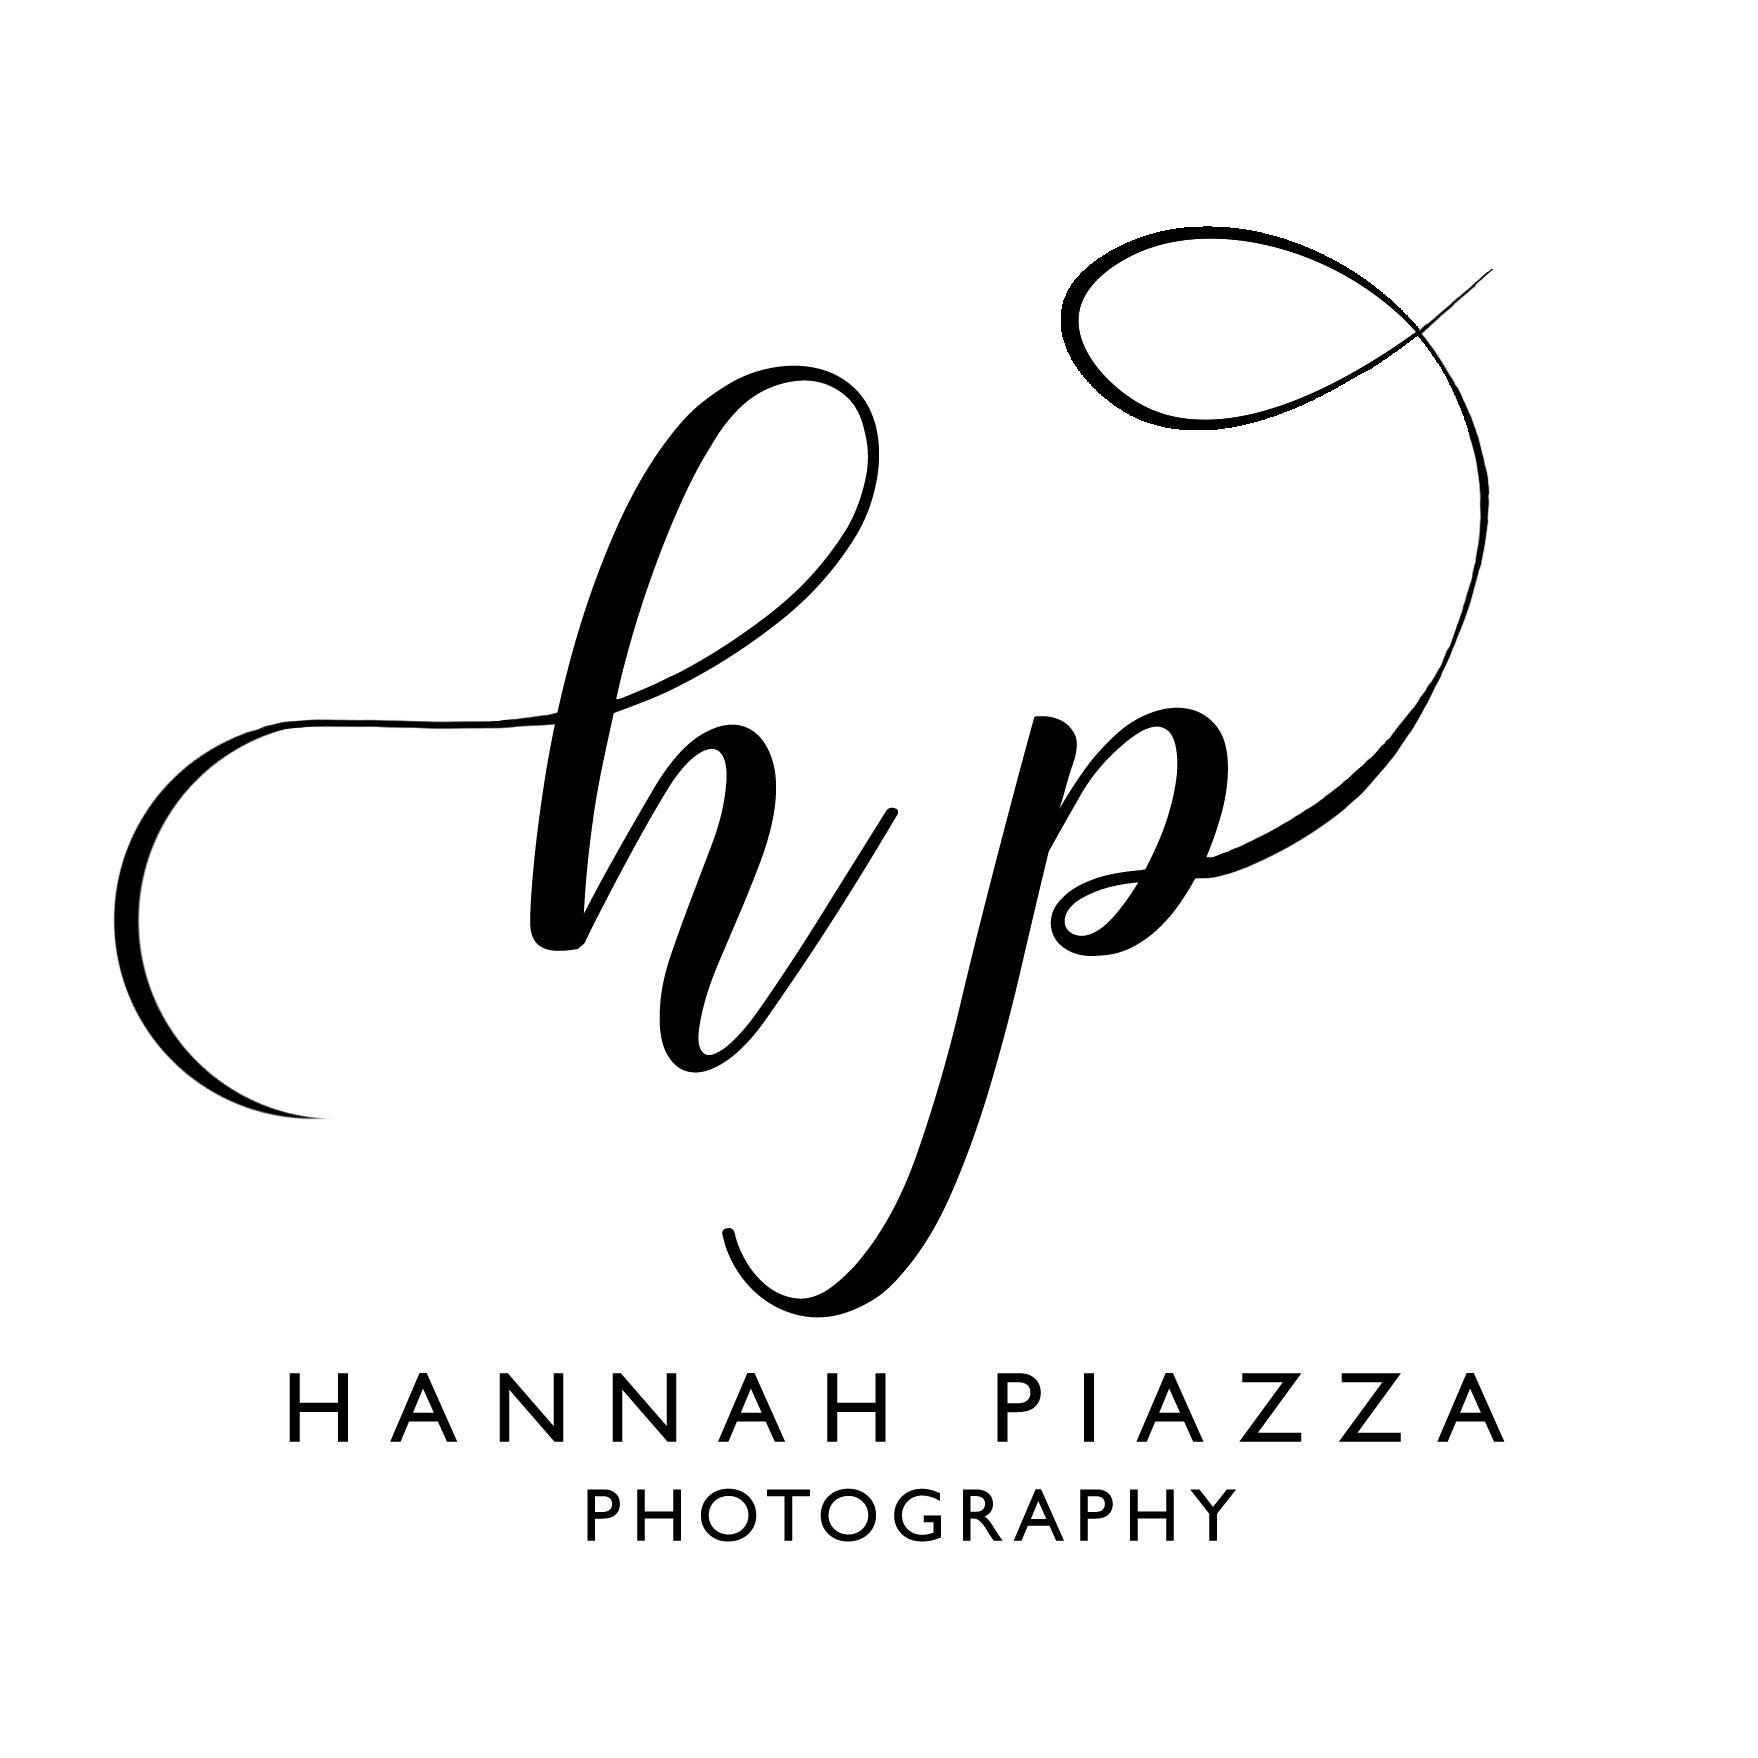 Hannah Piazza